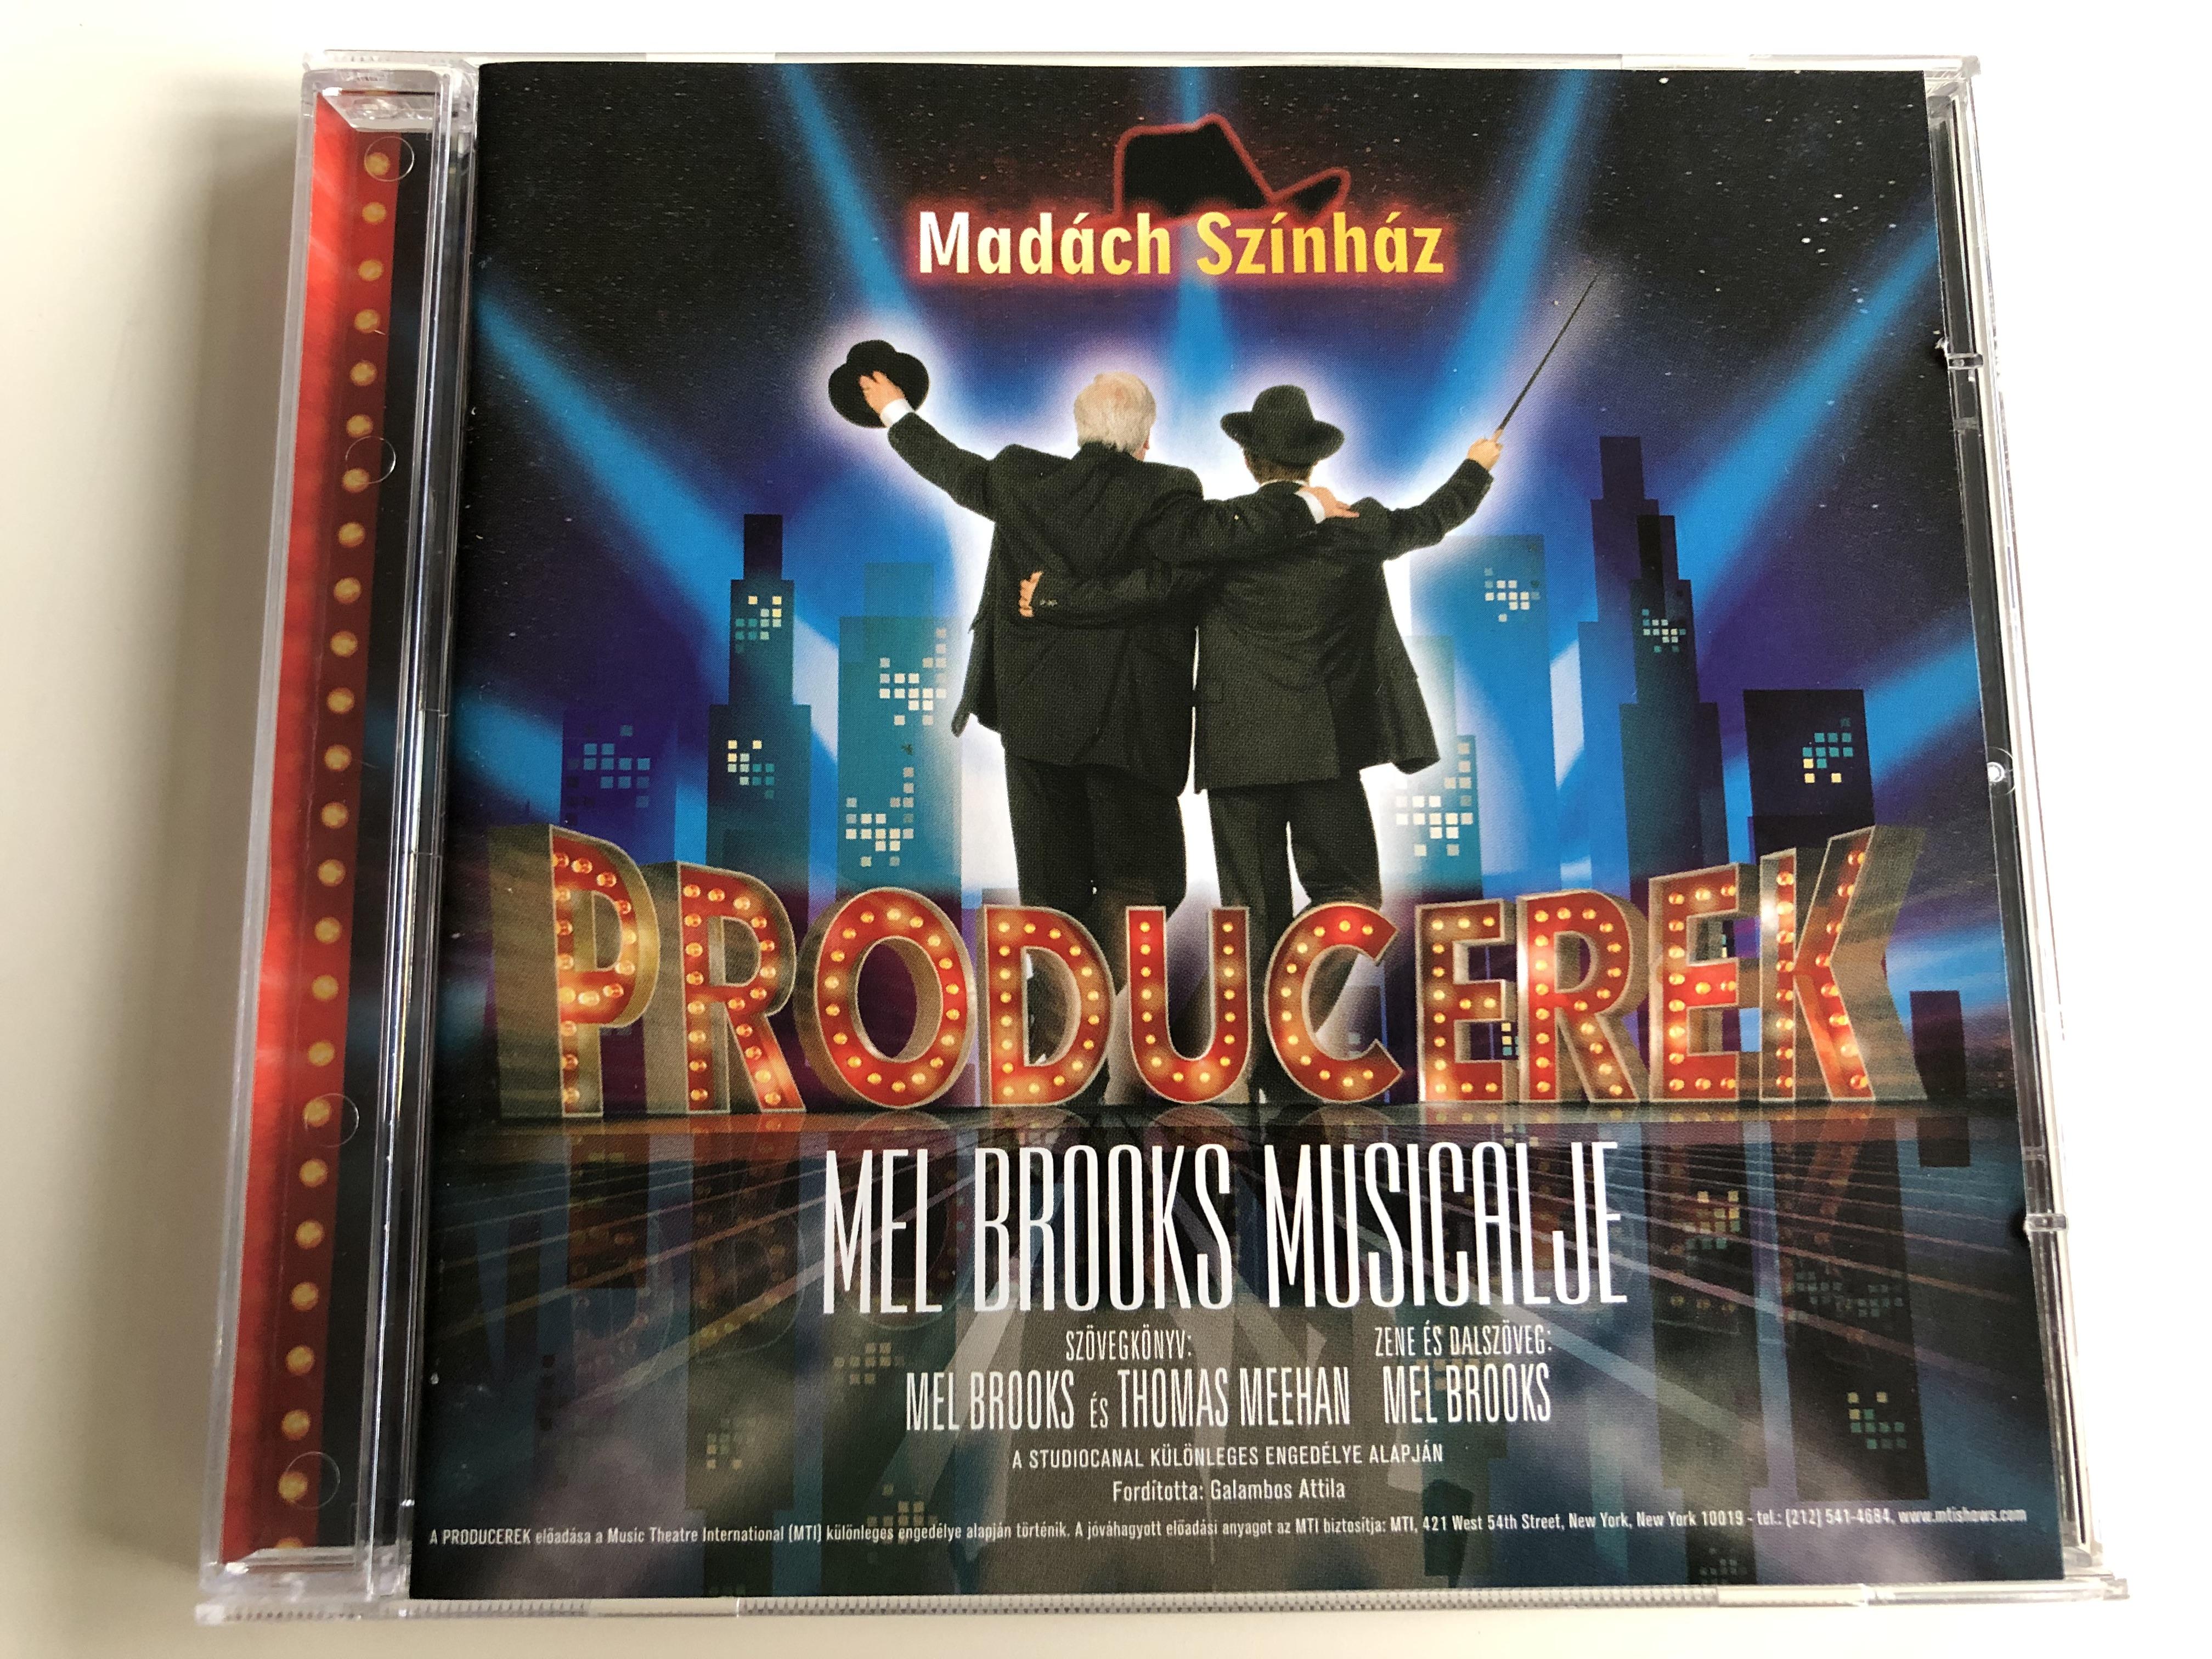 the-producers-audio-cd-2006-producerek-mel-brooks-musical-mad-ch-sz-nh-z-written-by-mel-brooks-thomas-meehan-conducted-by-kocs-k-tibor-1-.jpg